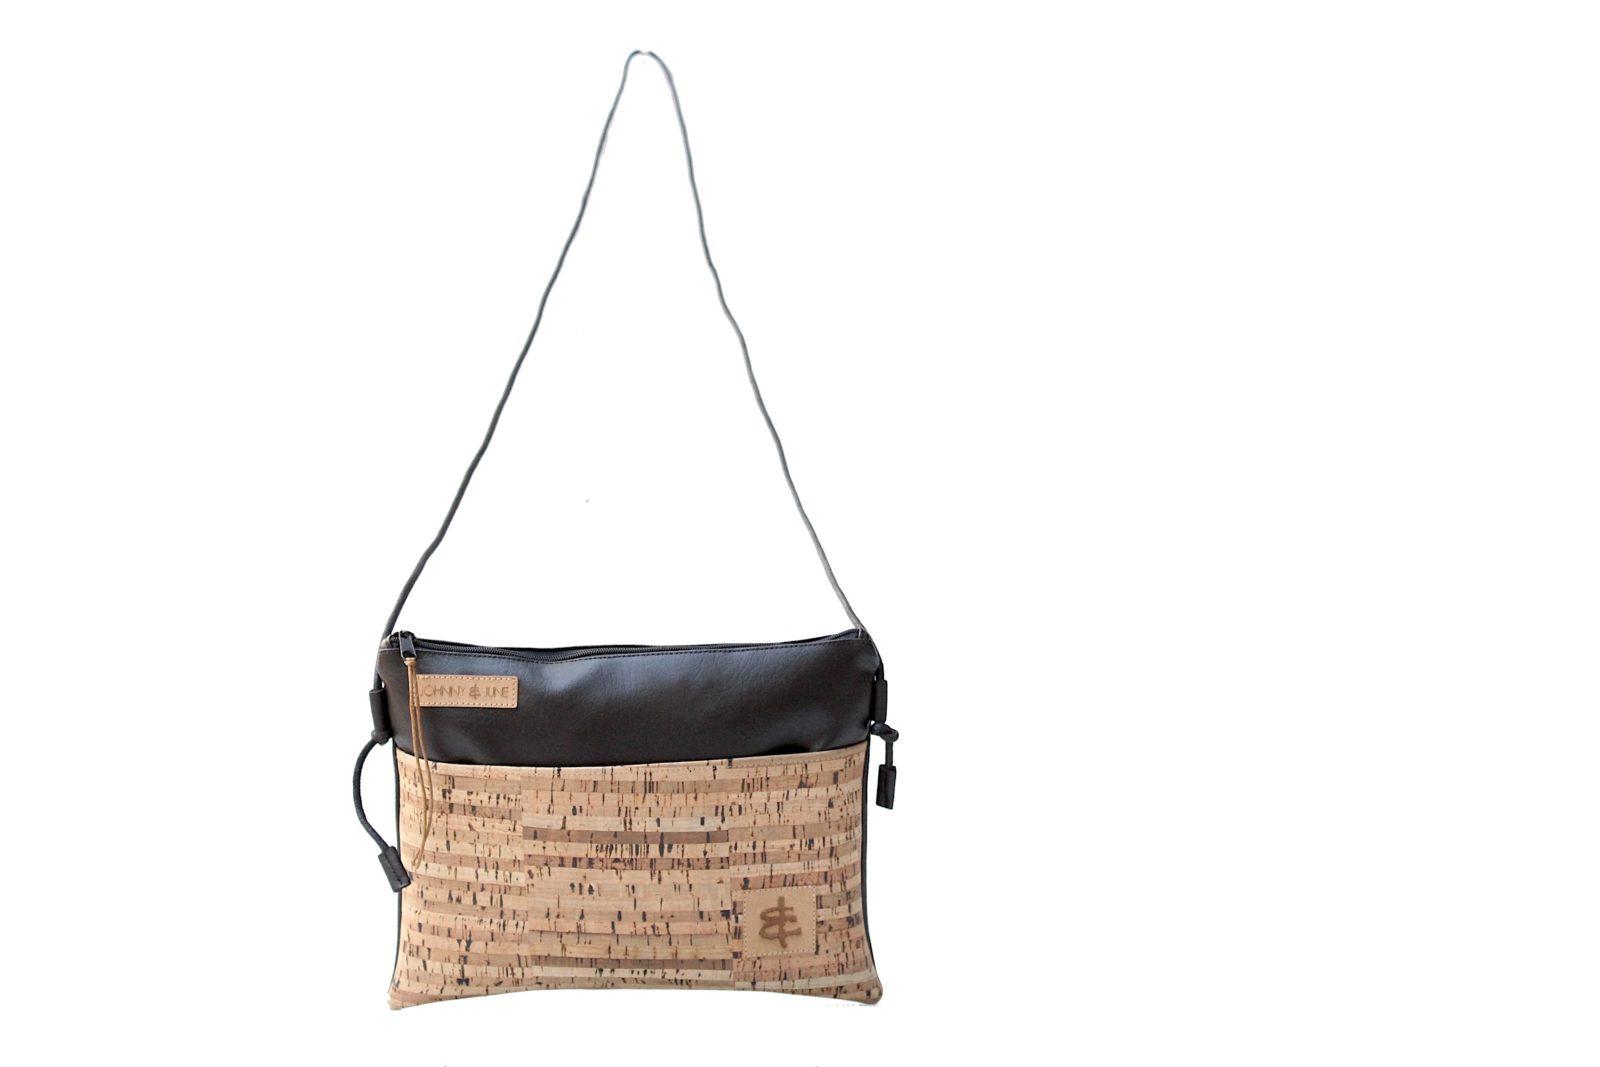 Unsere neuen Handtaschen Crossbody bags